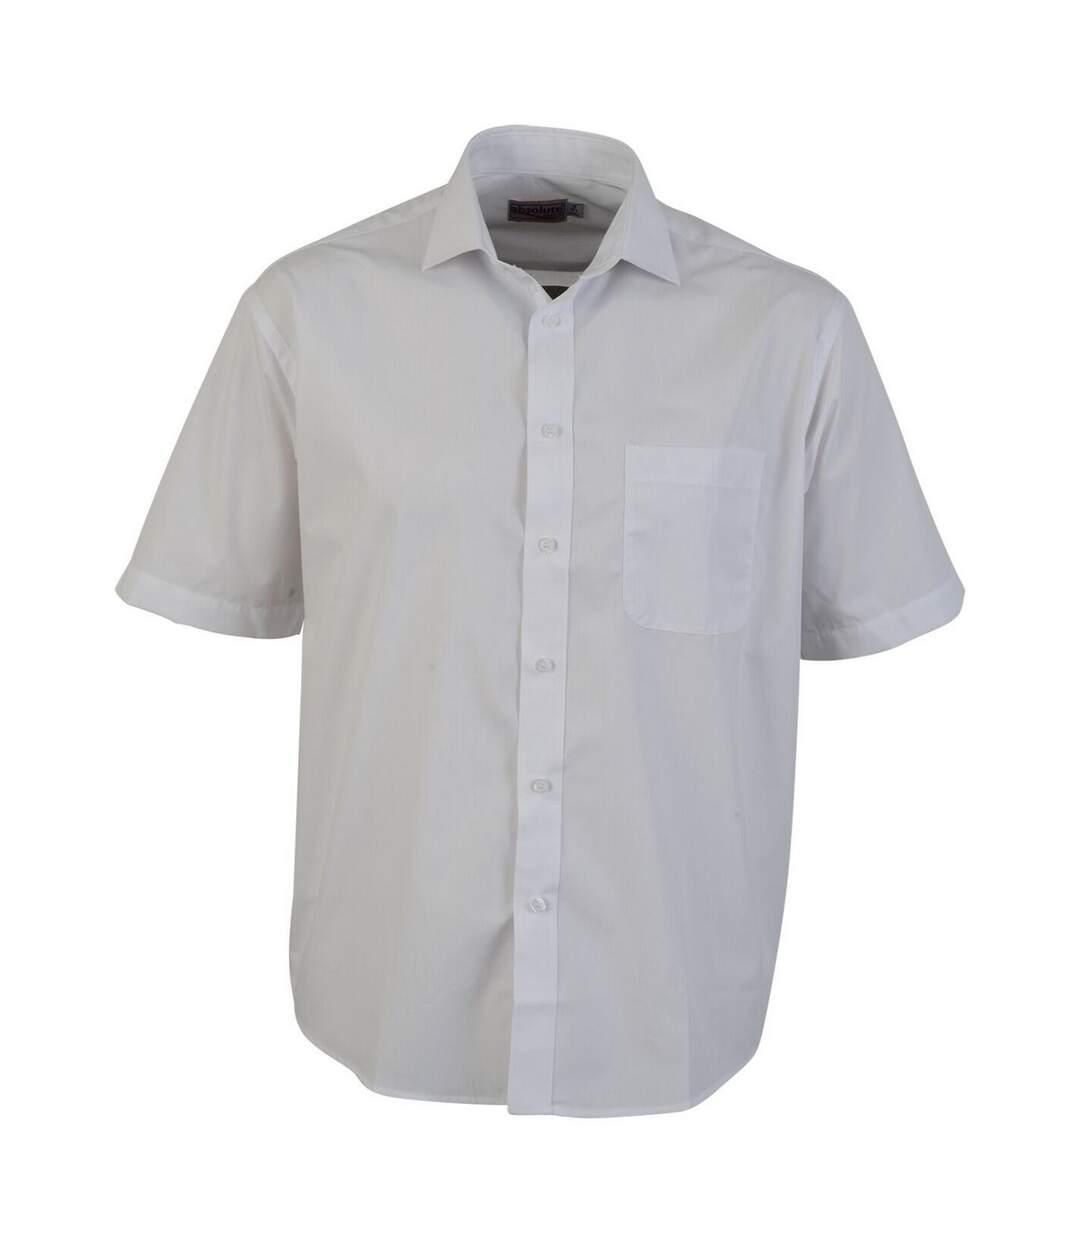 Absolute Apparel Mens Short Sleeved Classic Poplin Shirt (Black) - UTAB118